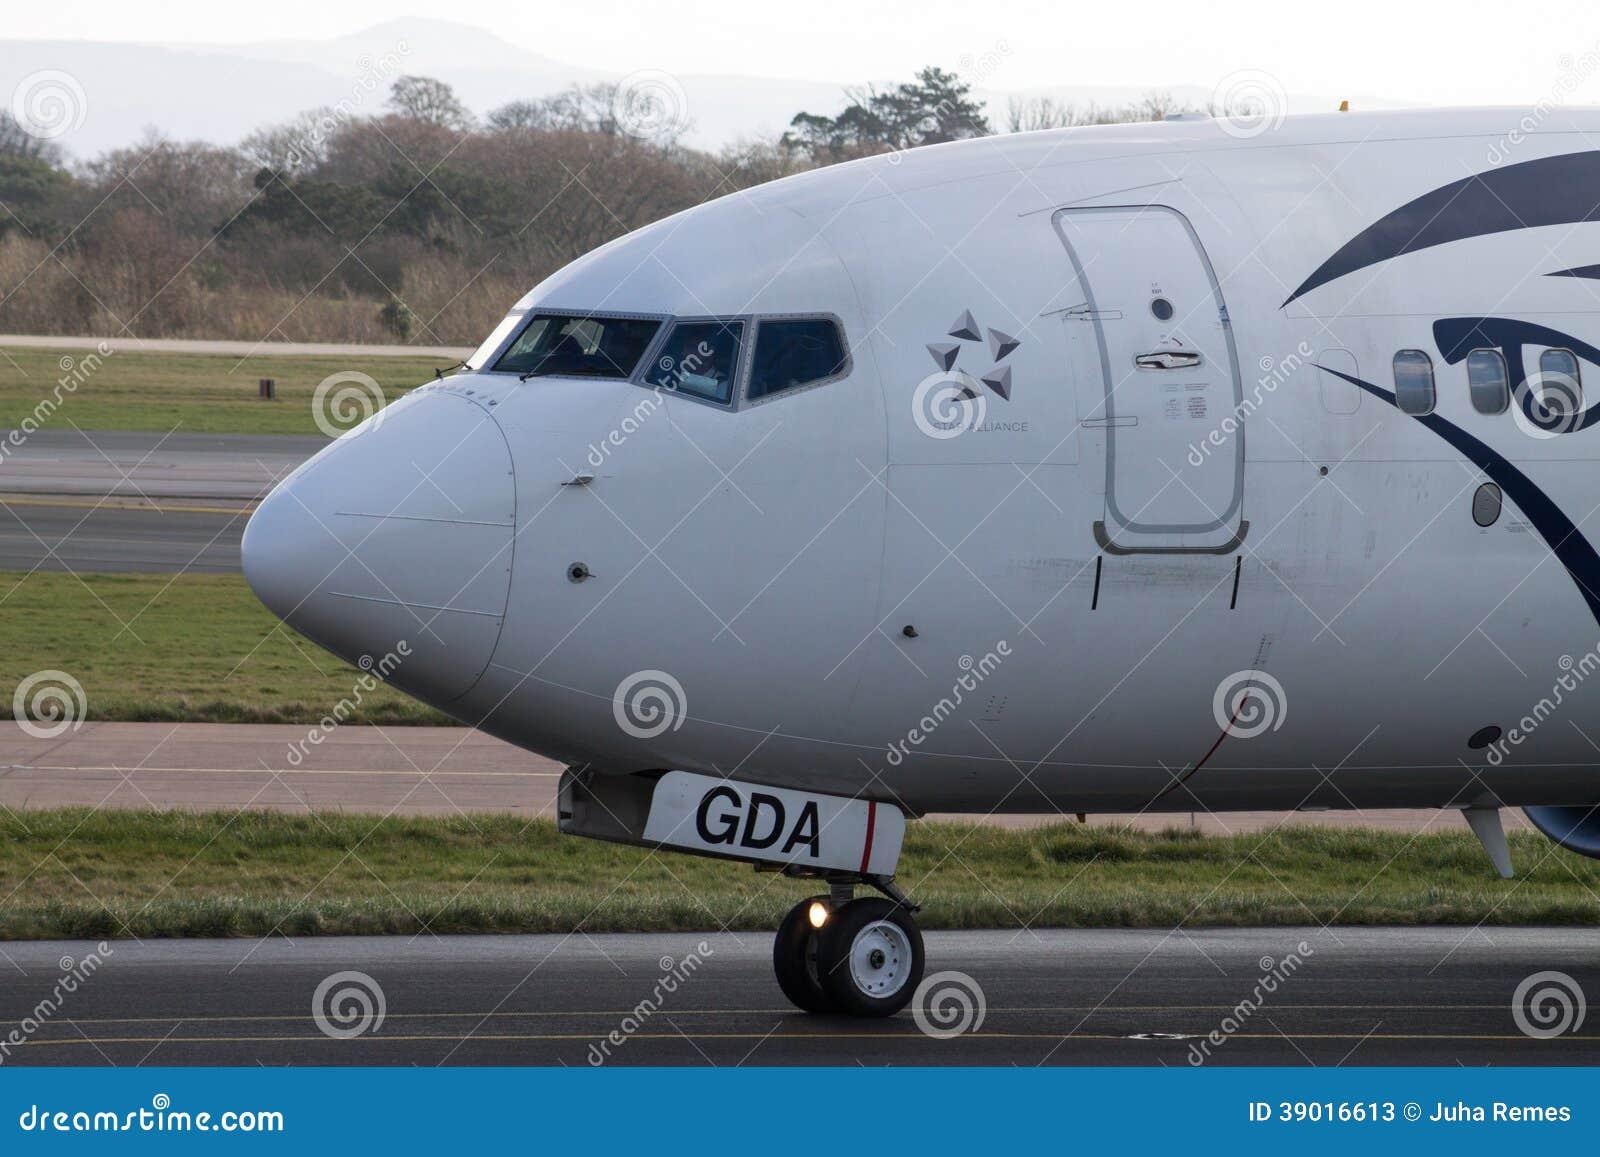 Manchester, United Kingdom - February 16, 2014: Egyptair Boeing